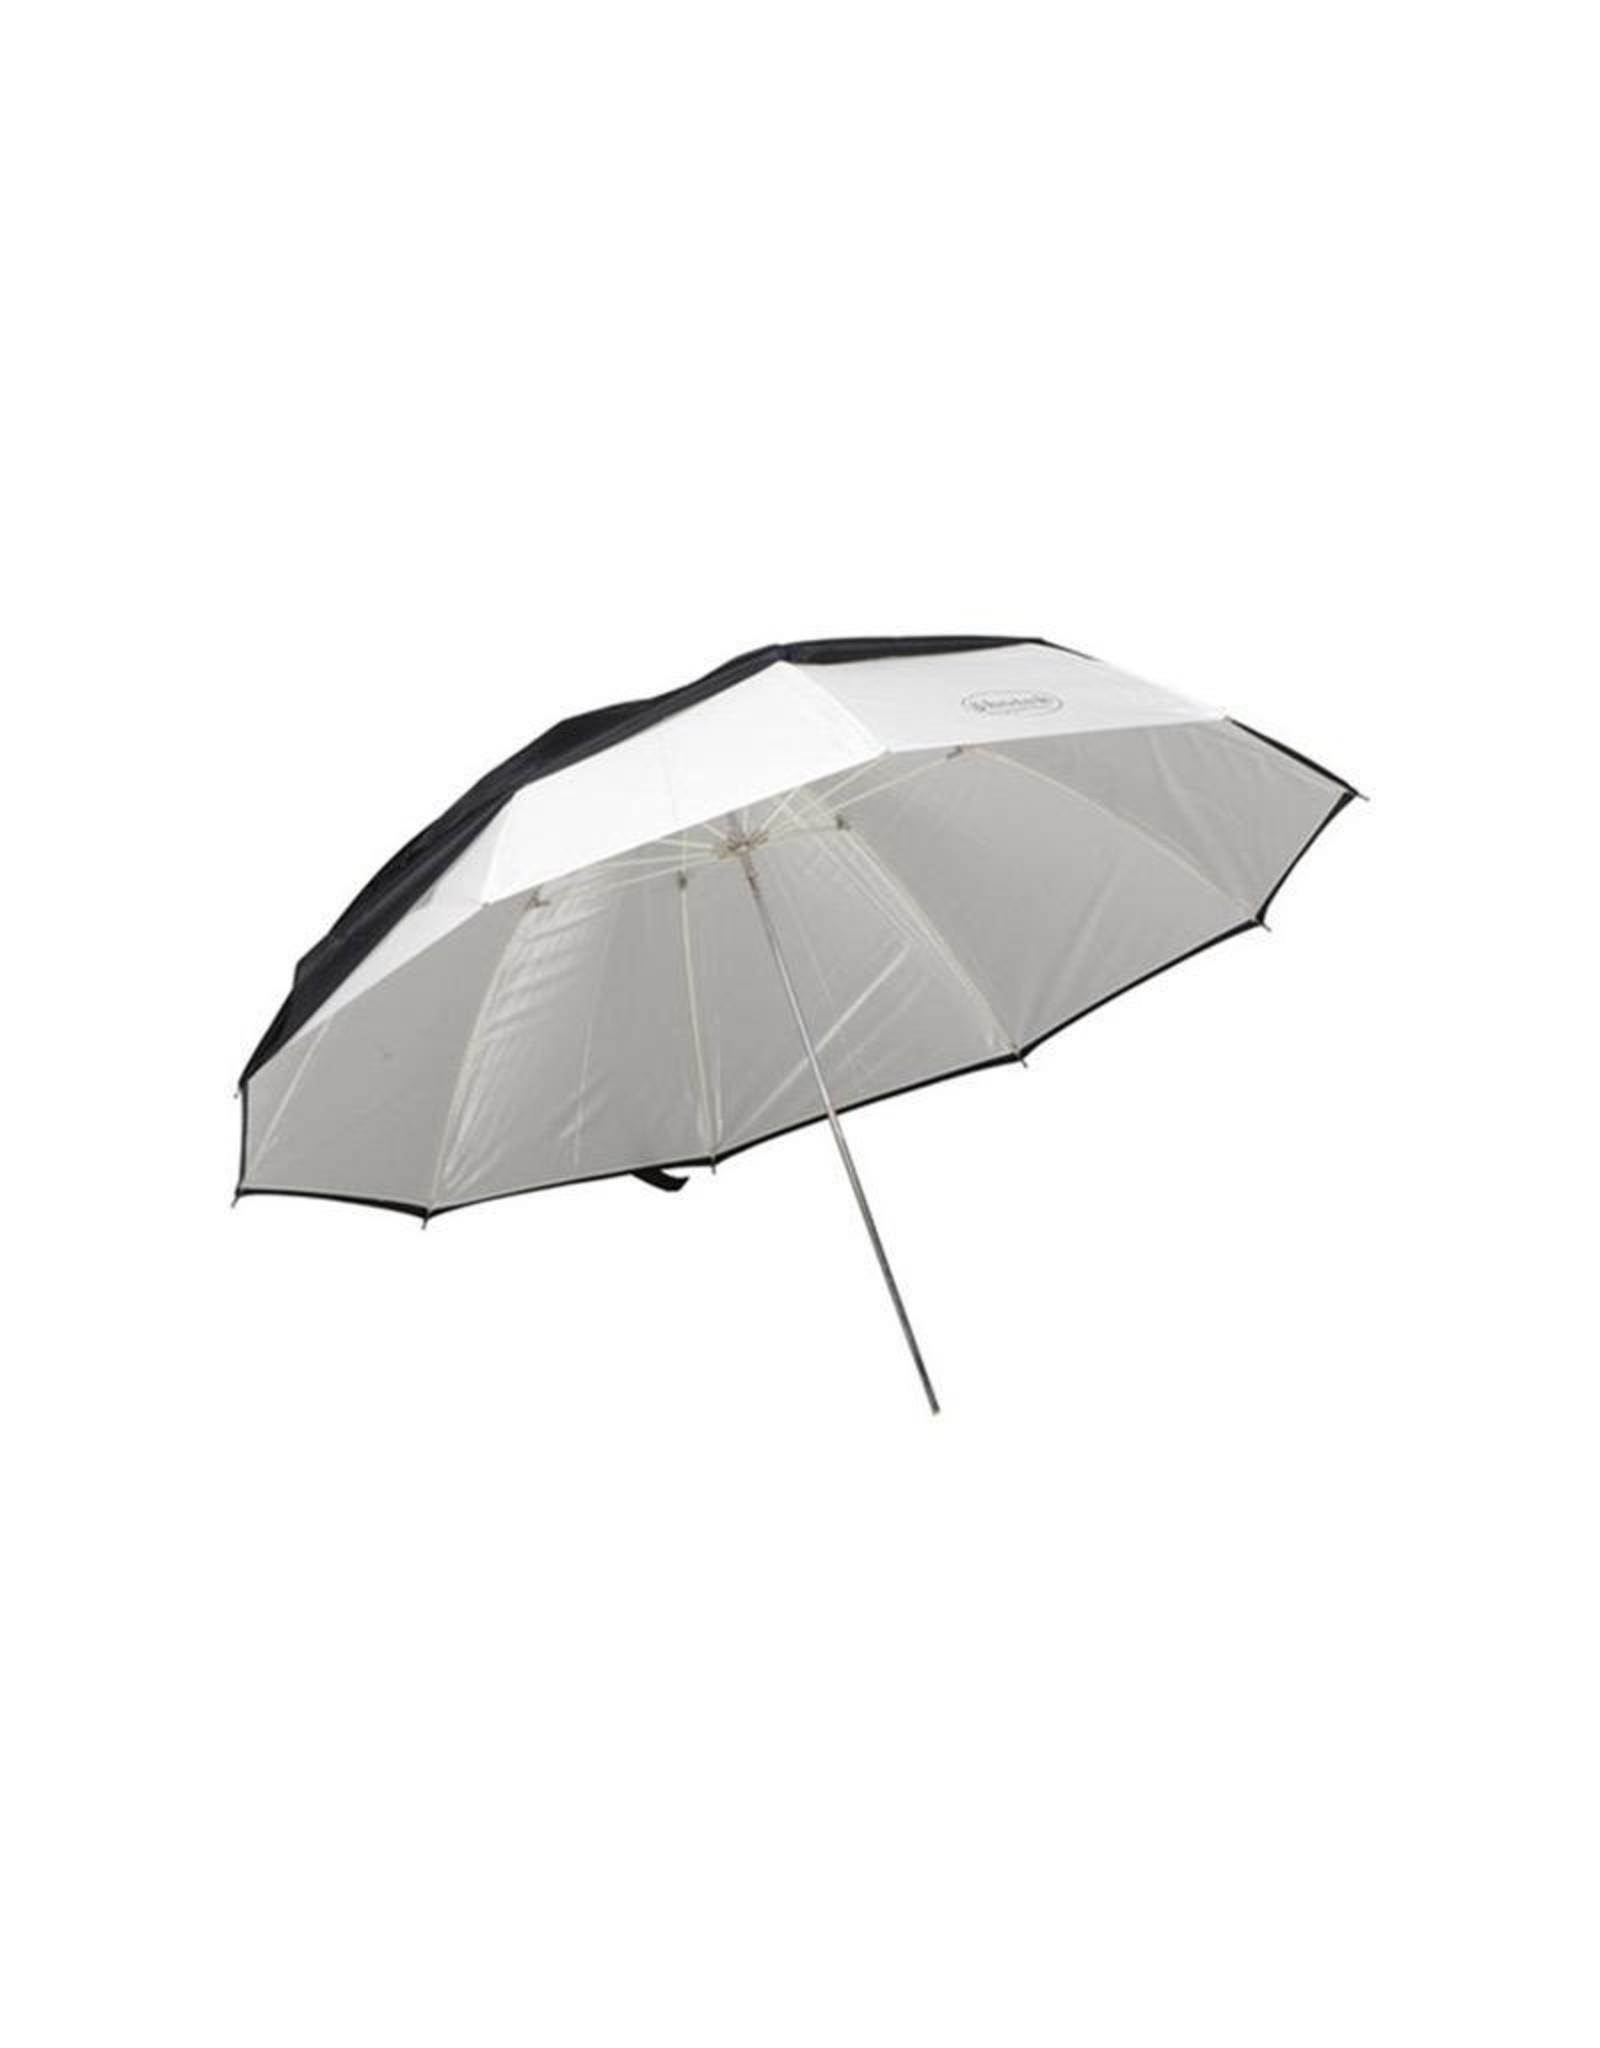 "Photek Photek GoodLighter 46"" Medium Umbrella, Silver, 8mm shaft"